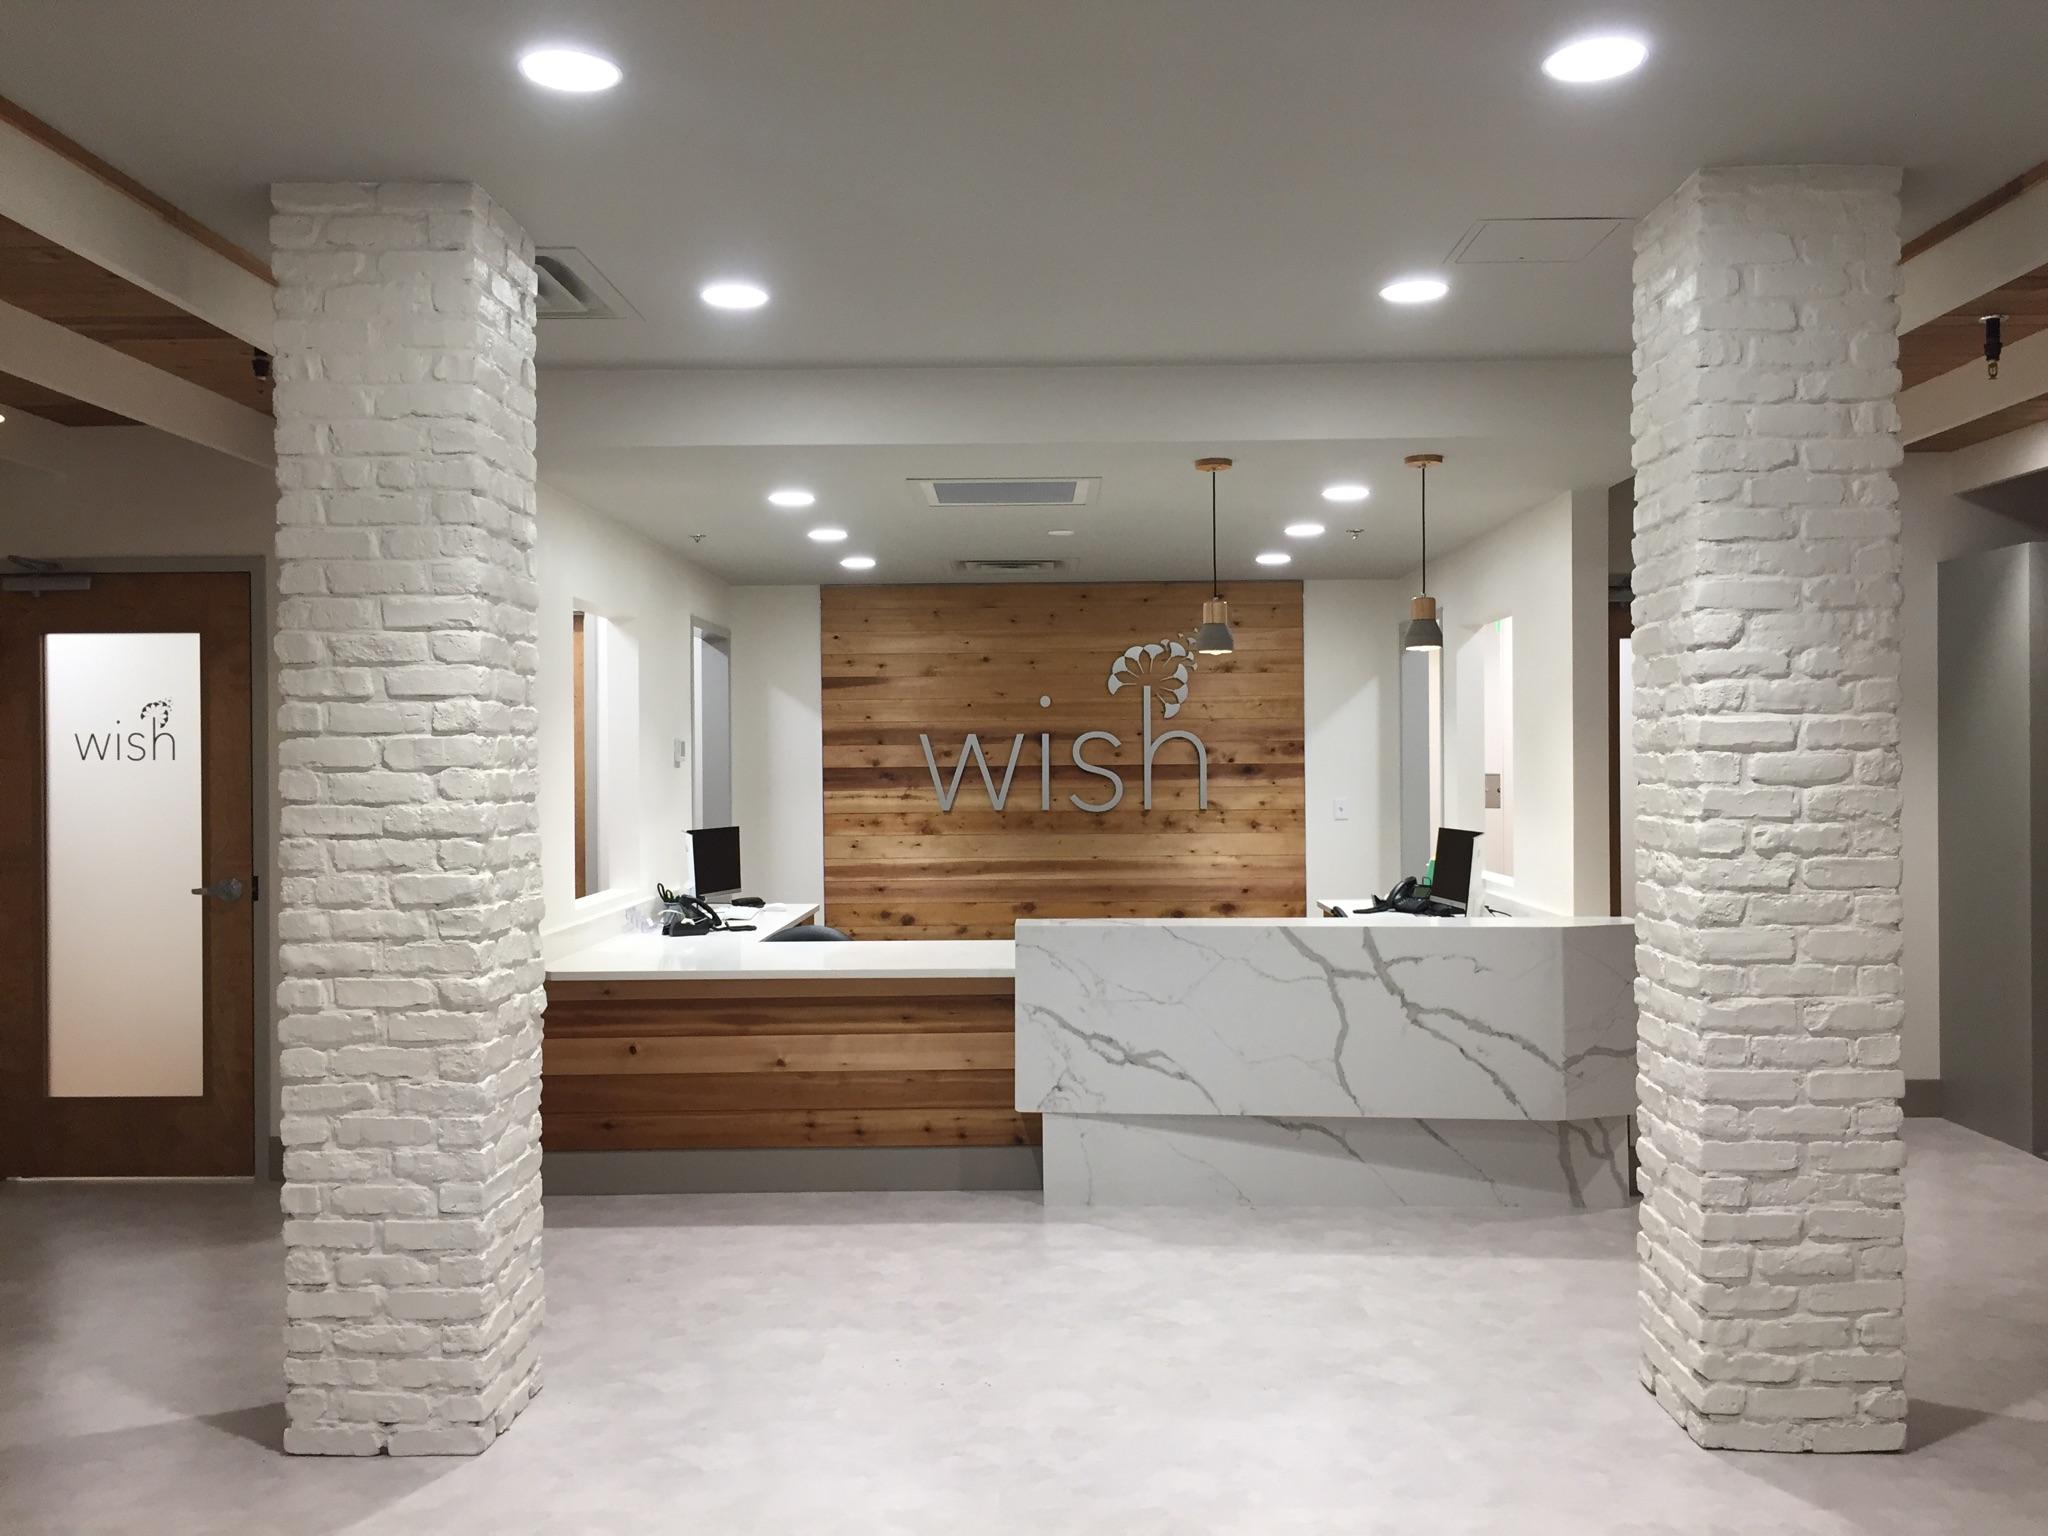 WISH Office Entrance.jpg